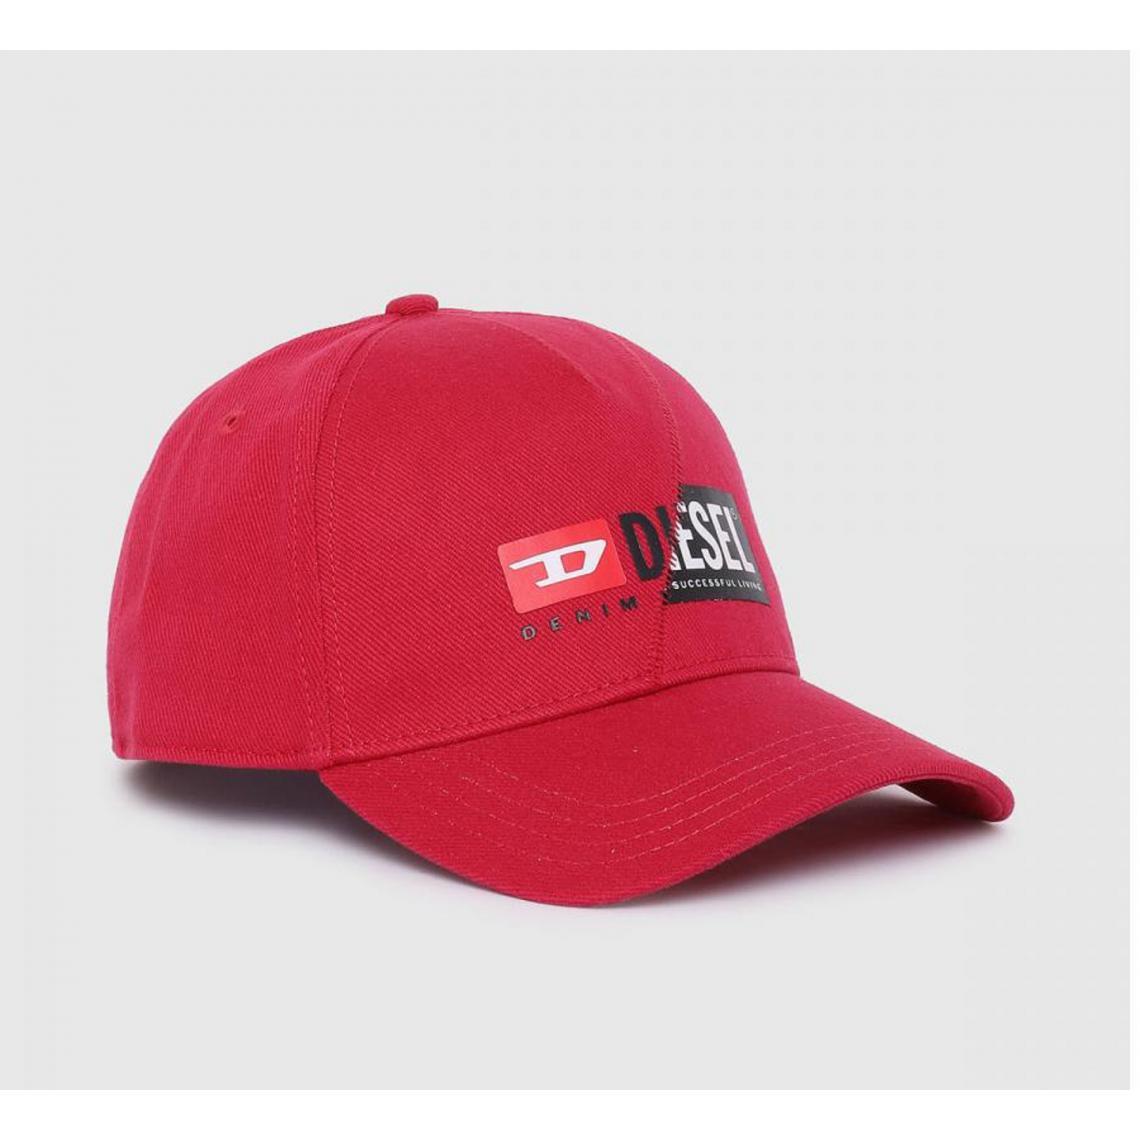 Casquette homme rouge logo - Diesel - Diesel Maroquinerie - Modalova